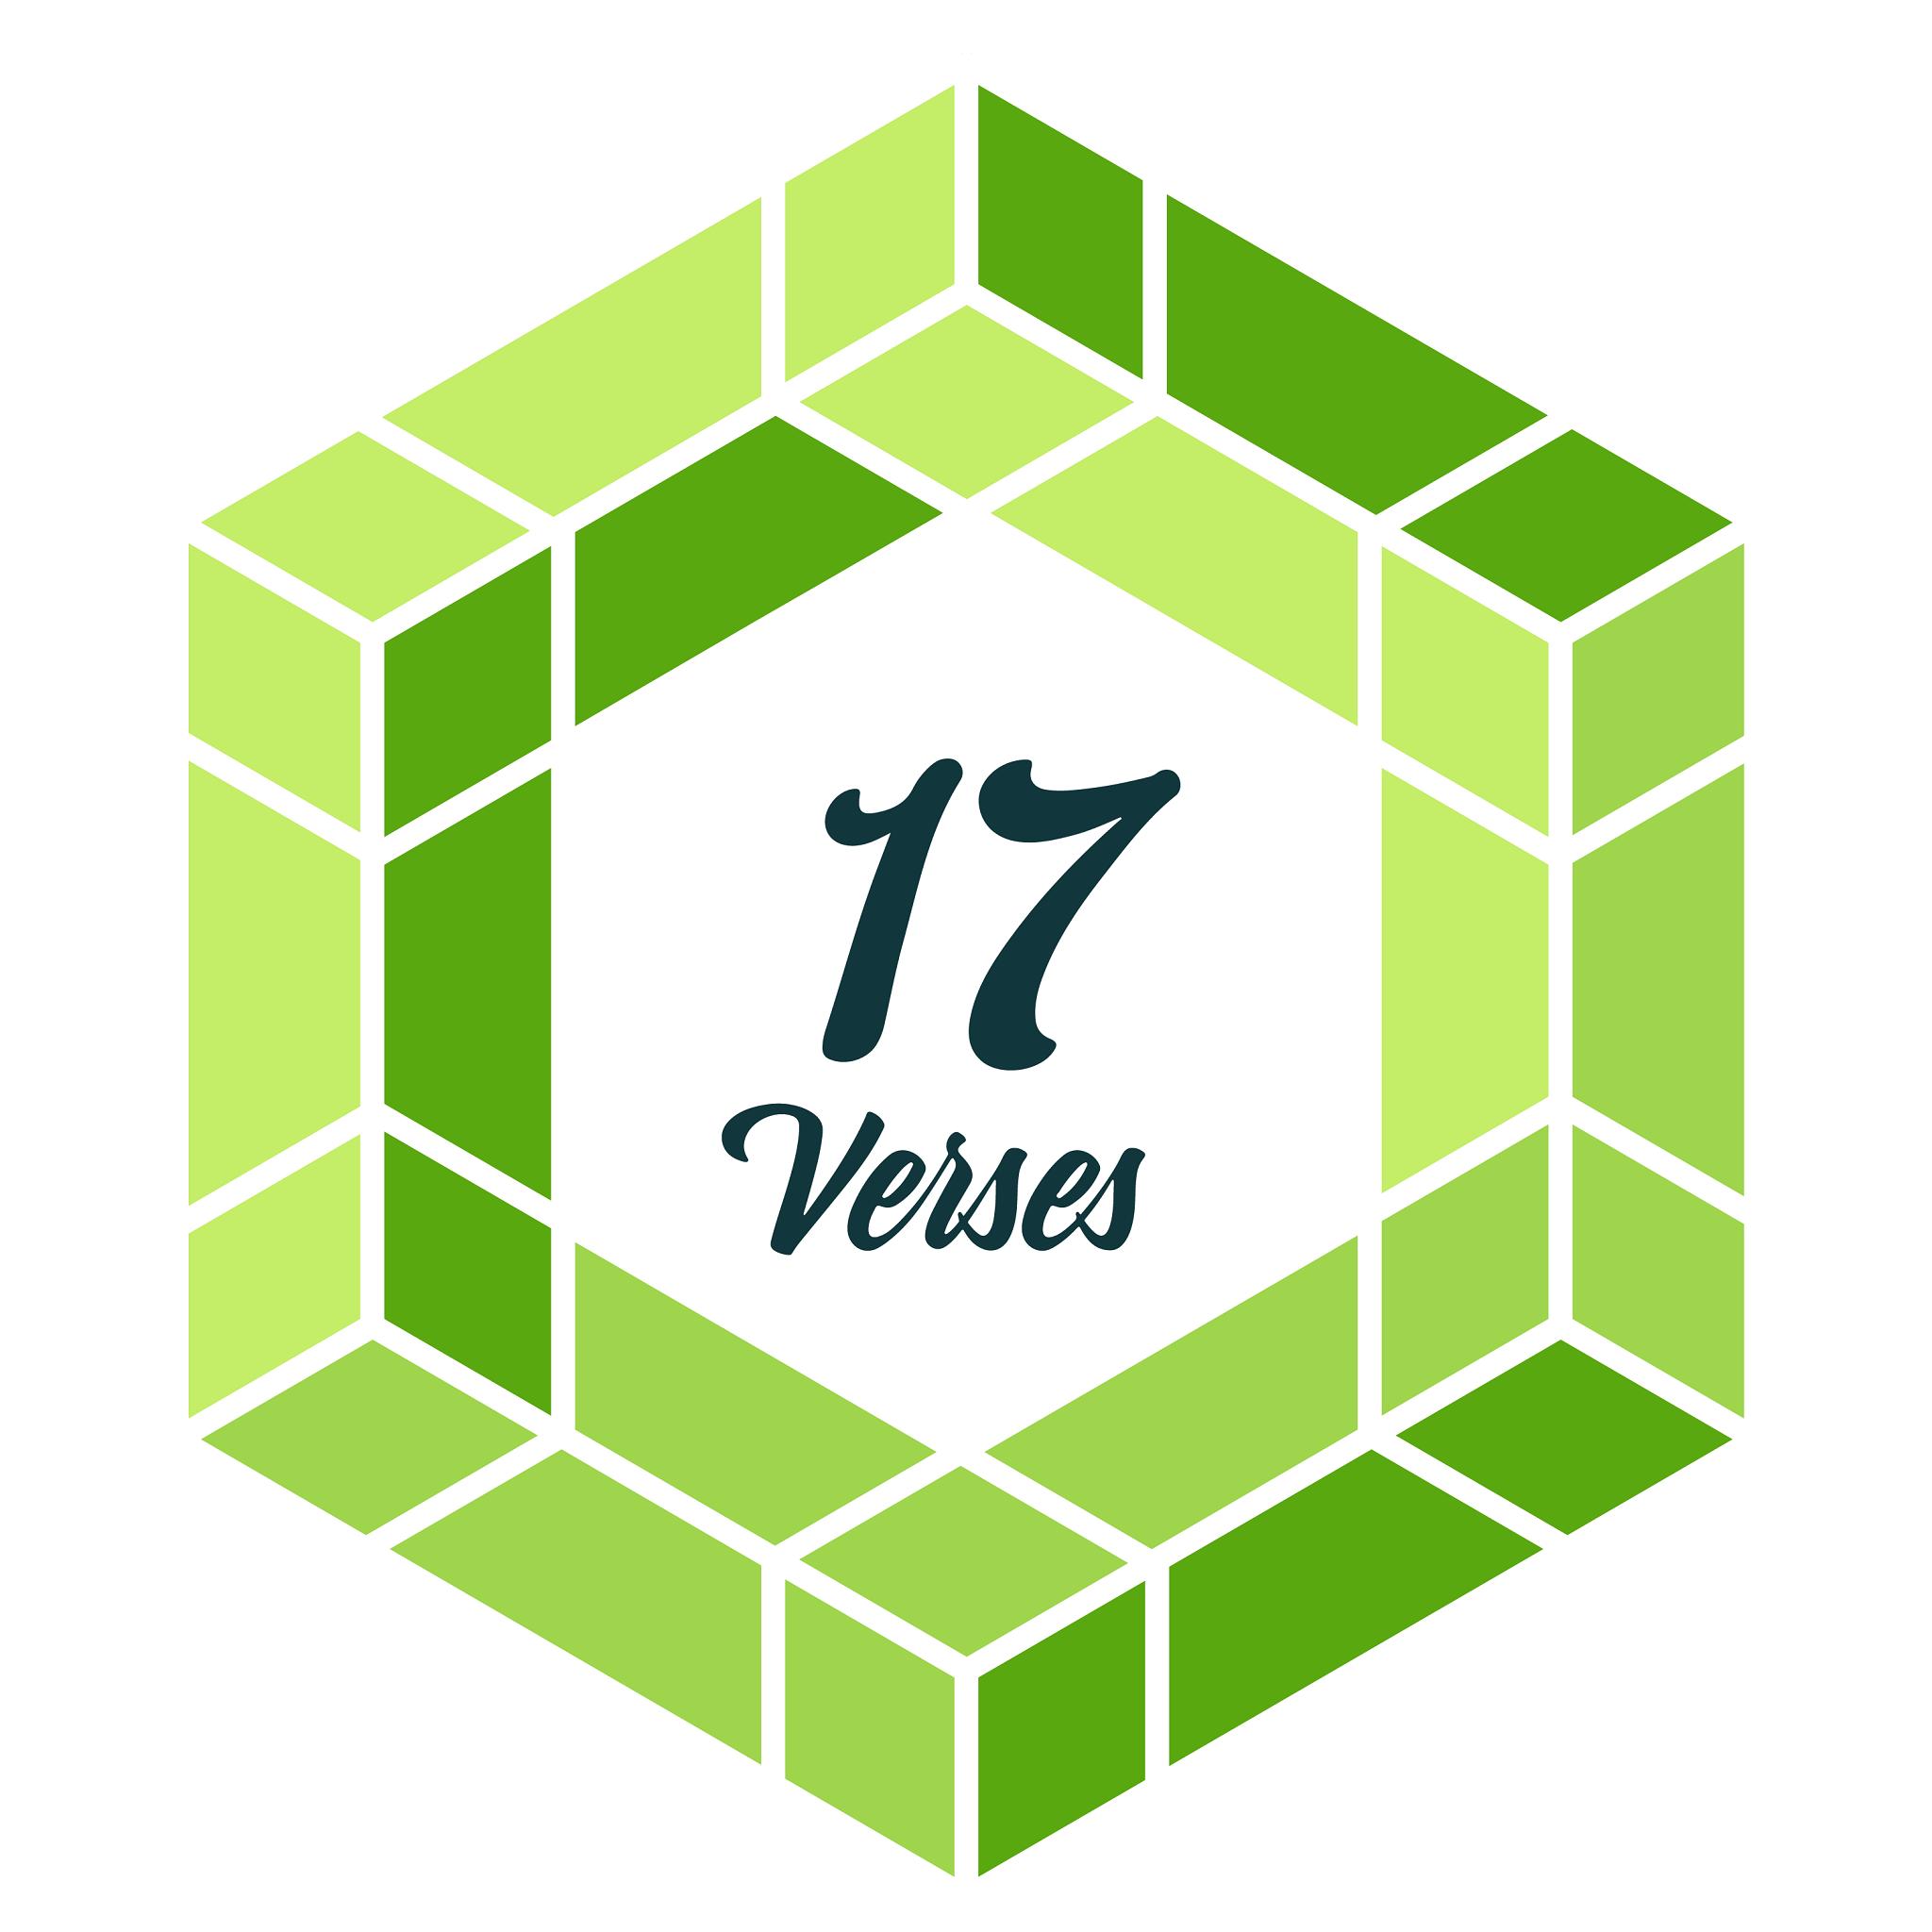 Year 2 - Surah 64 (At-Taghâbun)